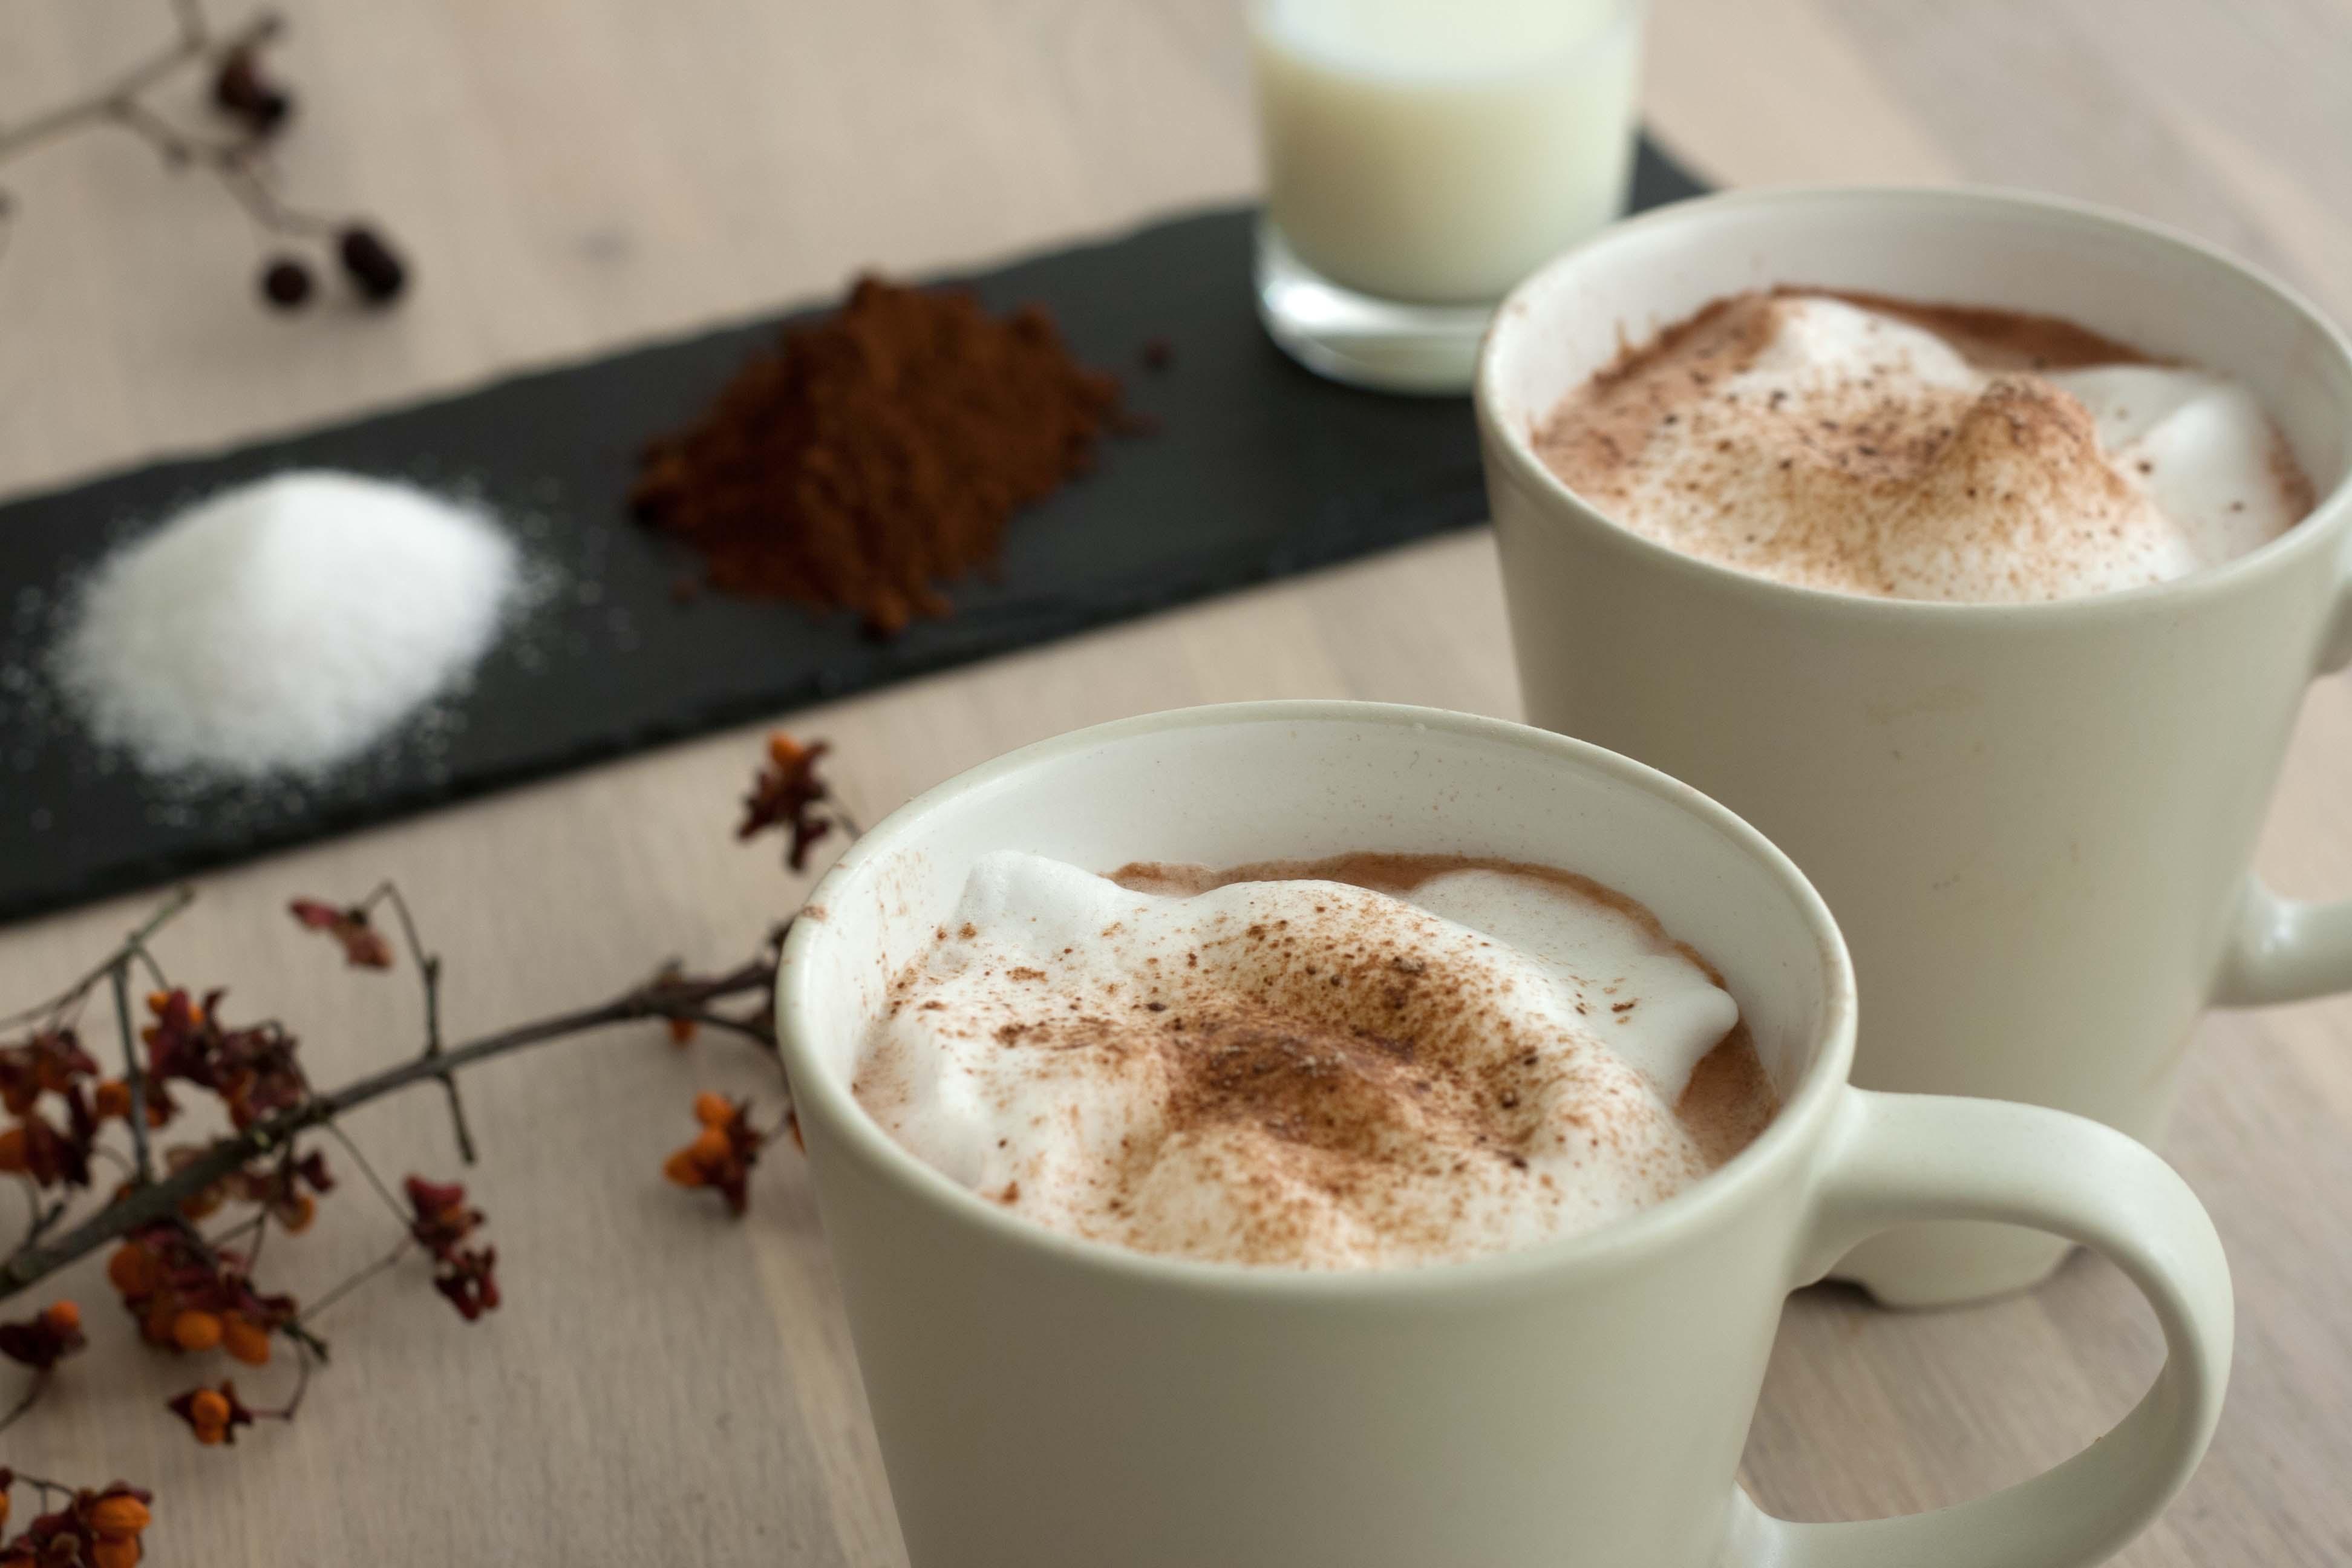 Opskrift på Nem hjemmelavet varm kakao med mælkeskum